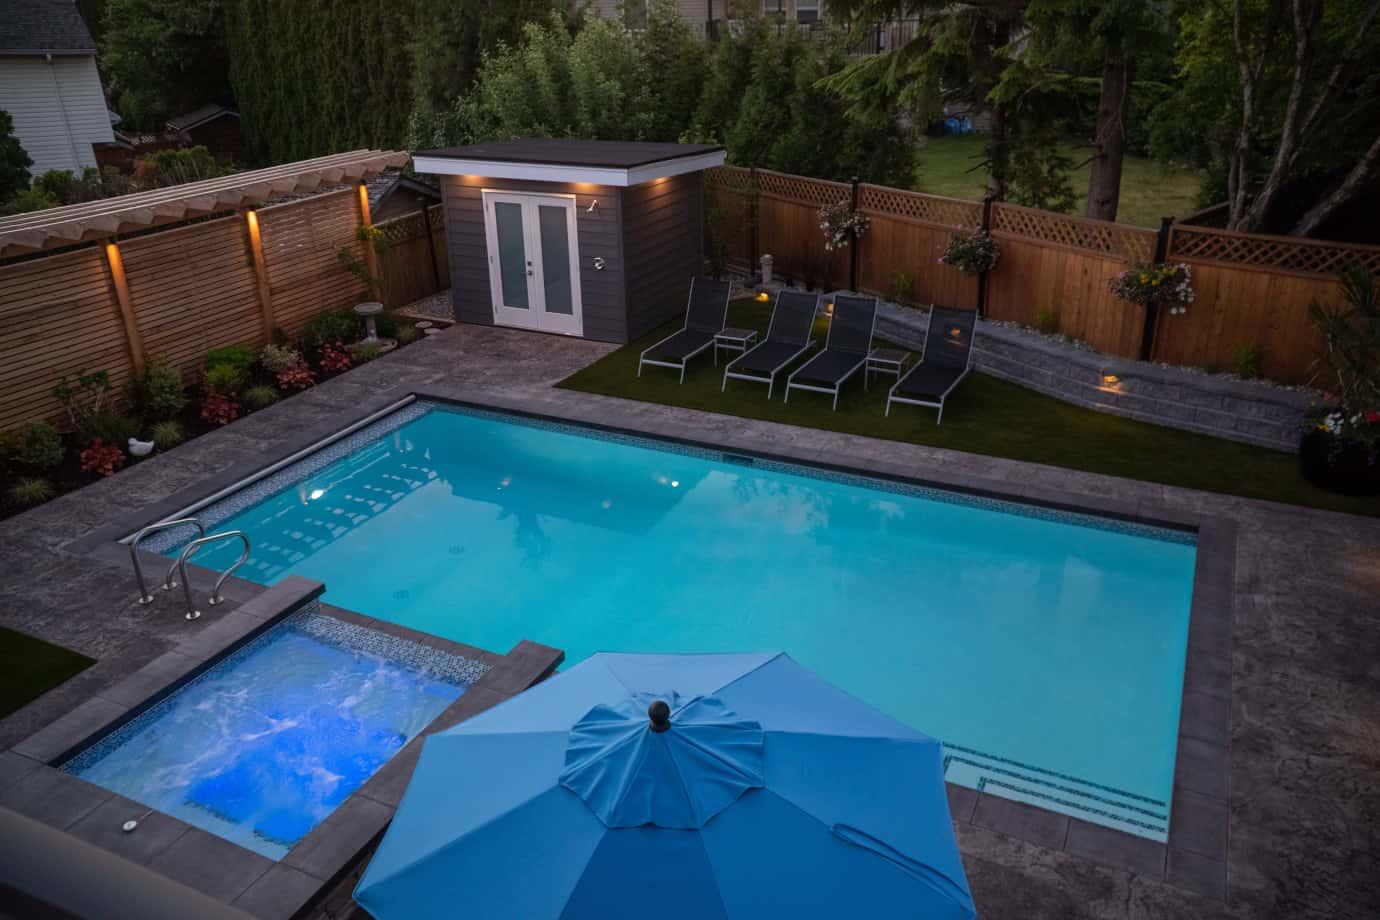 custom-swimming-pool-azuro-Hor23